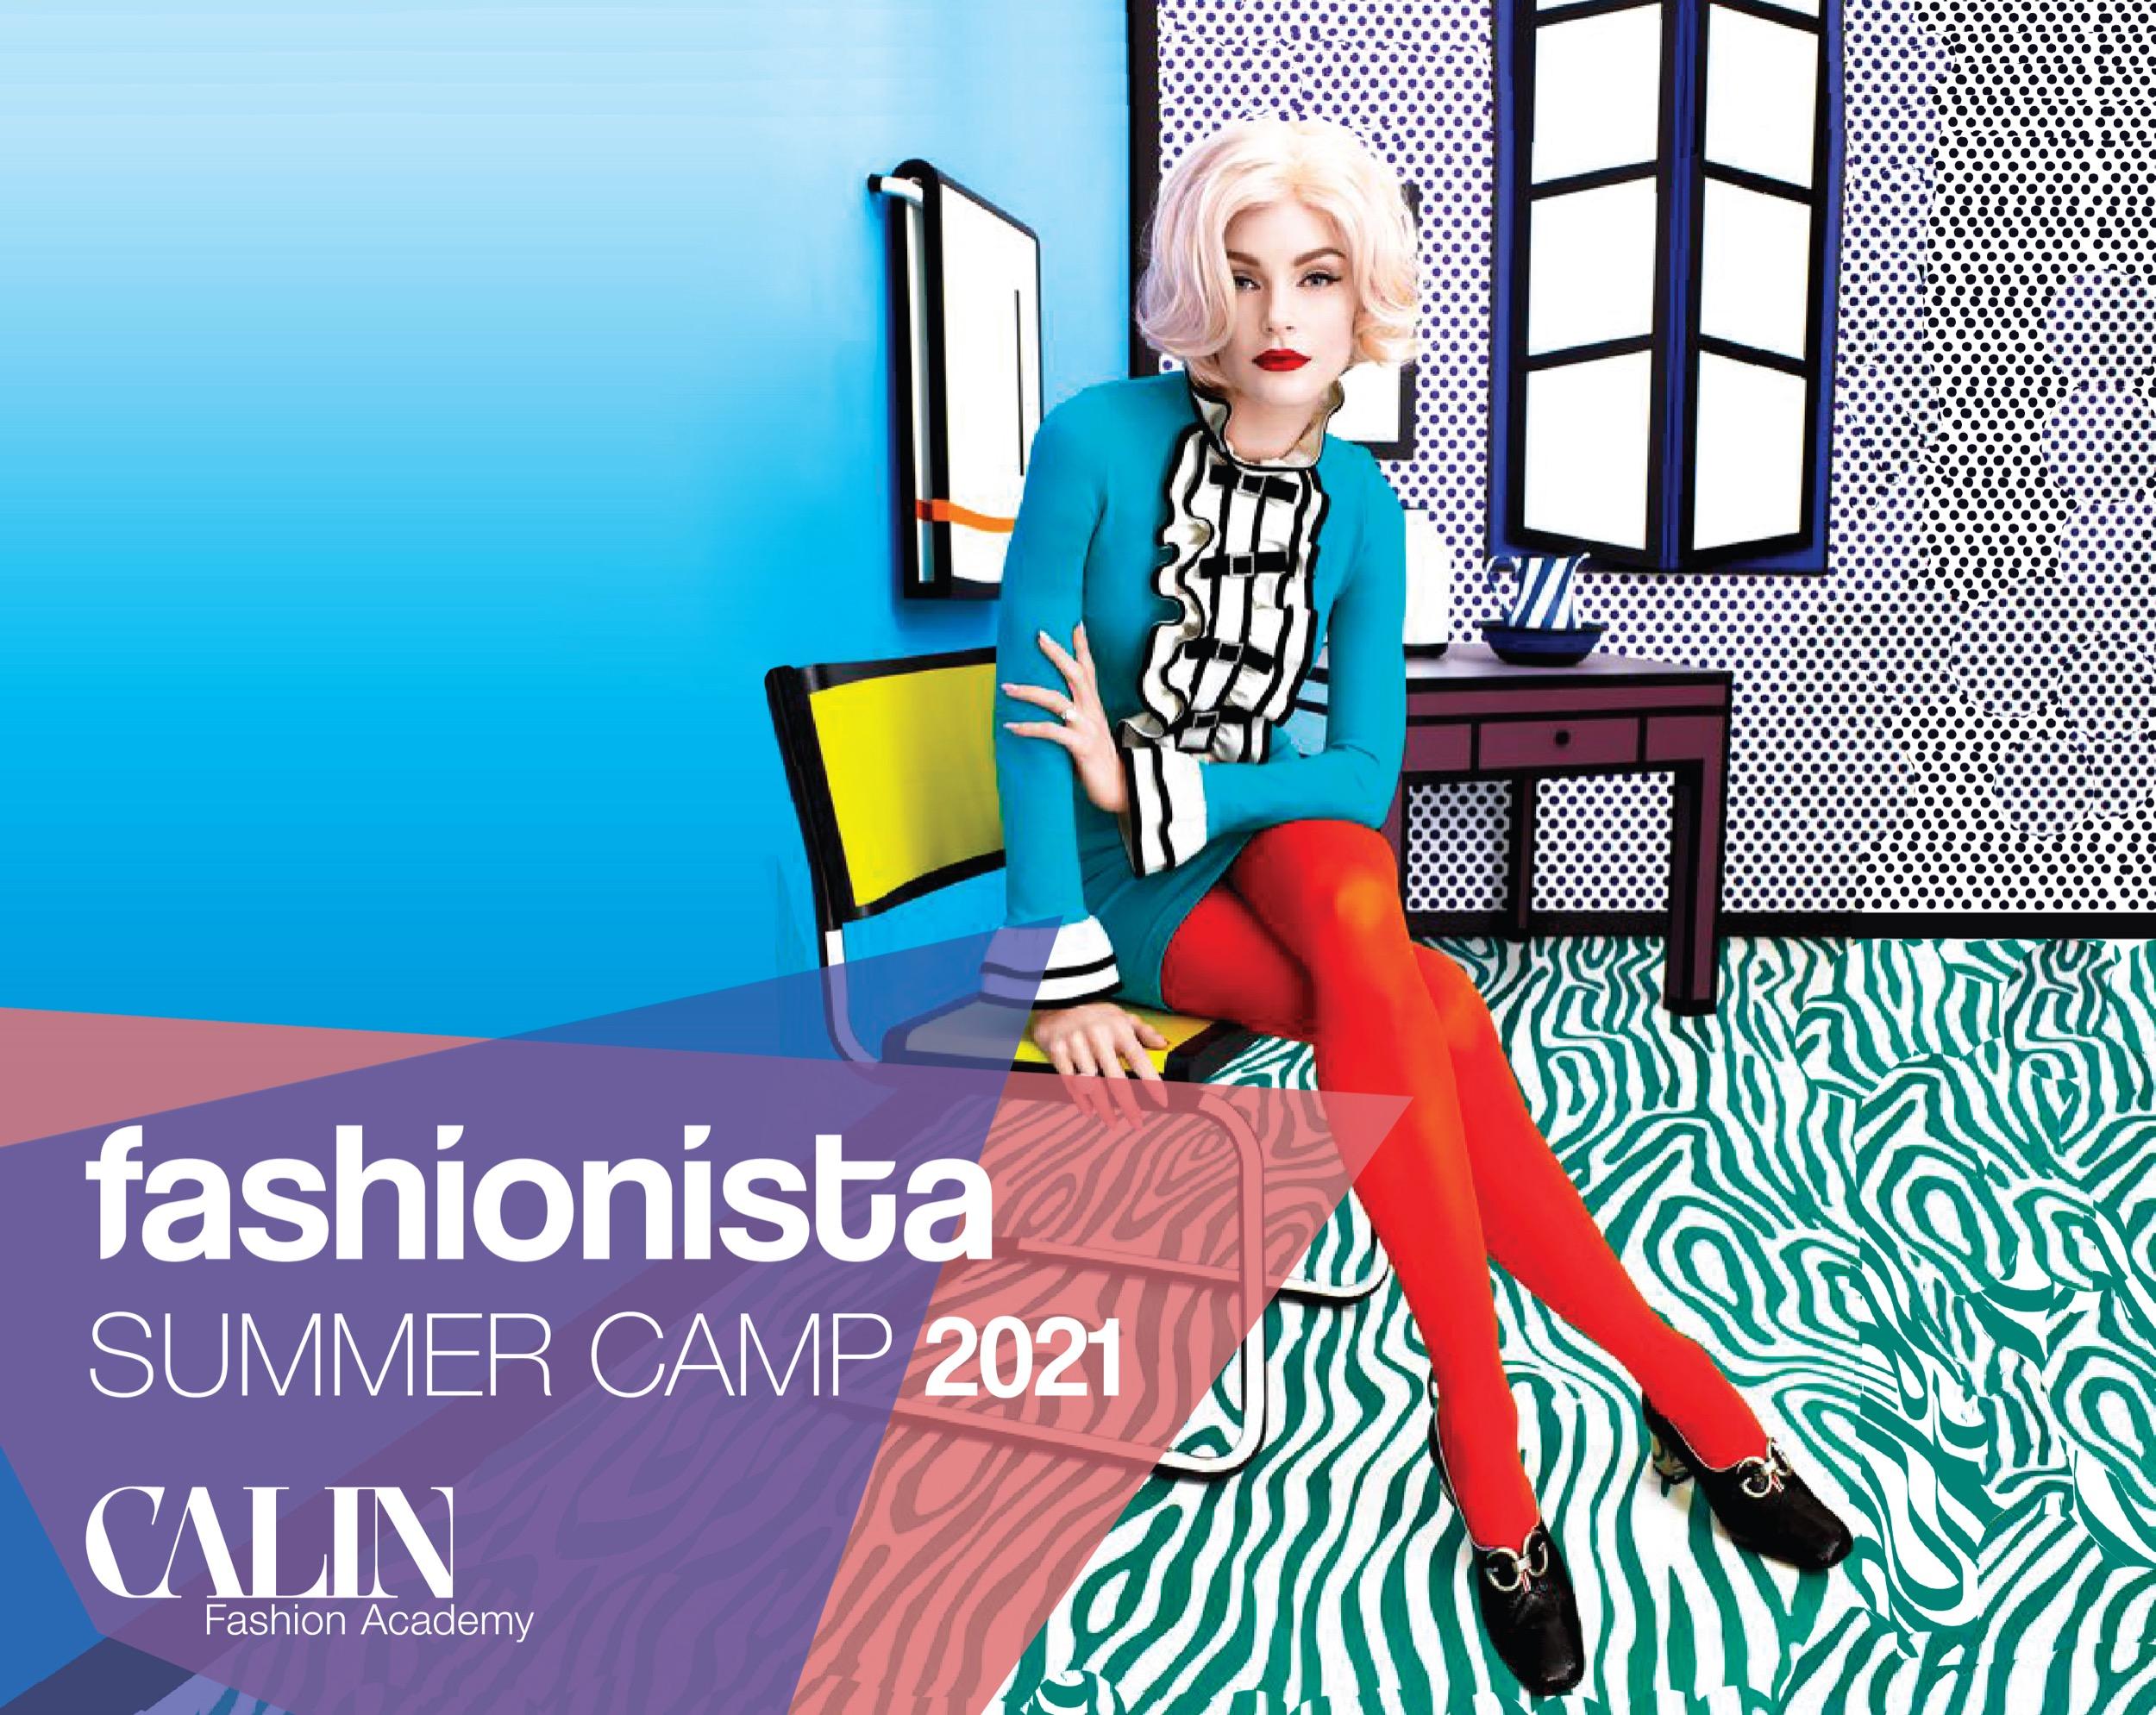 Fashionista Summer Camp 2021